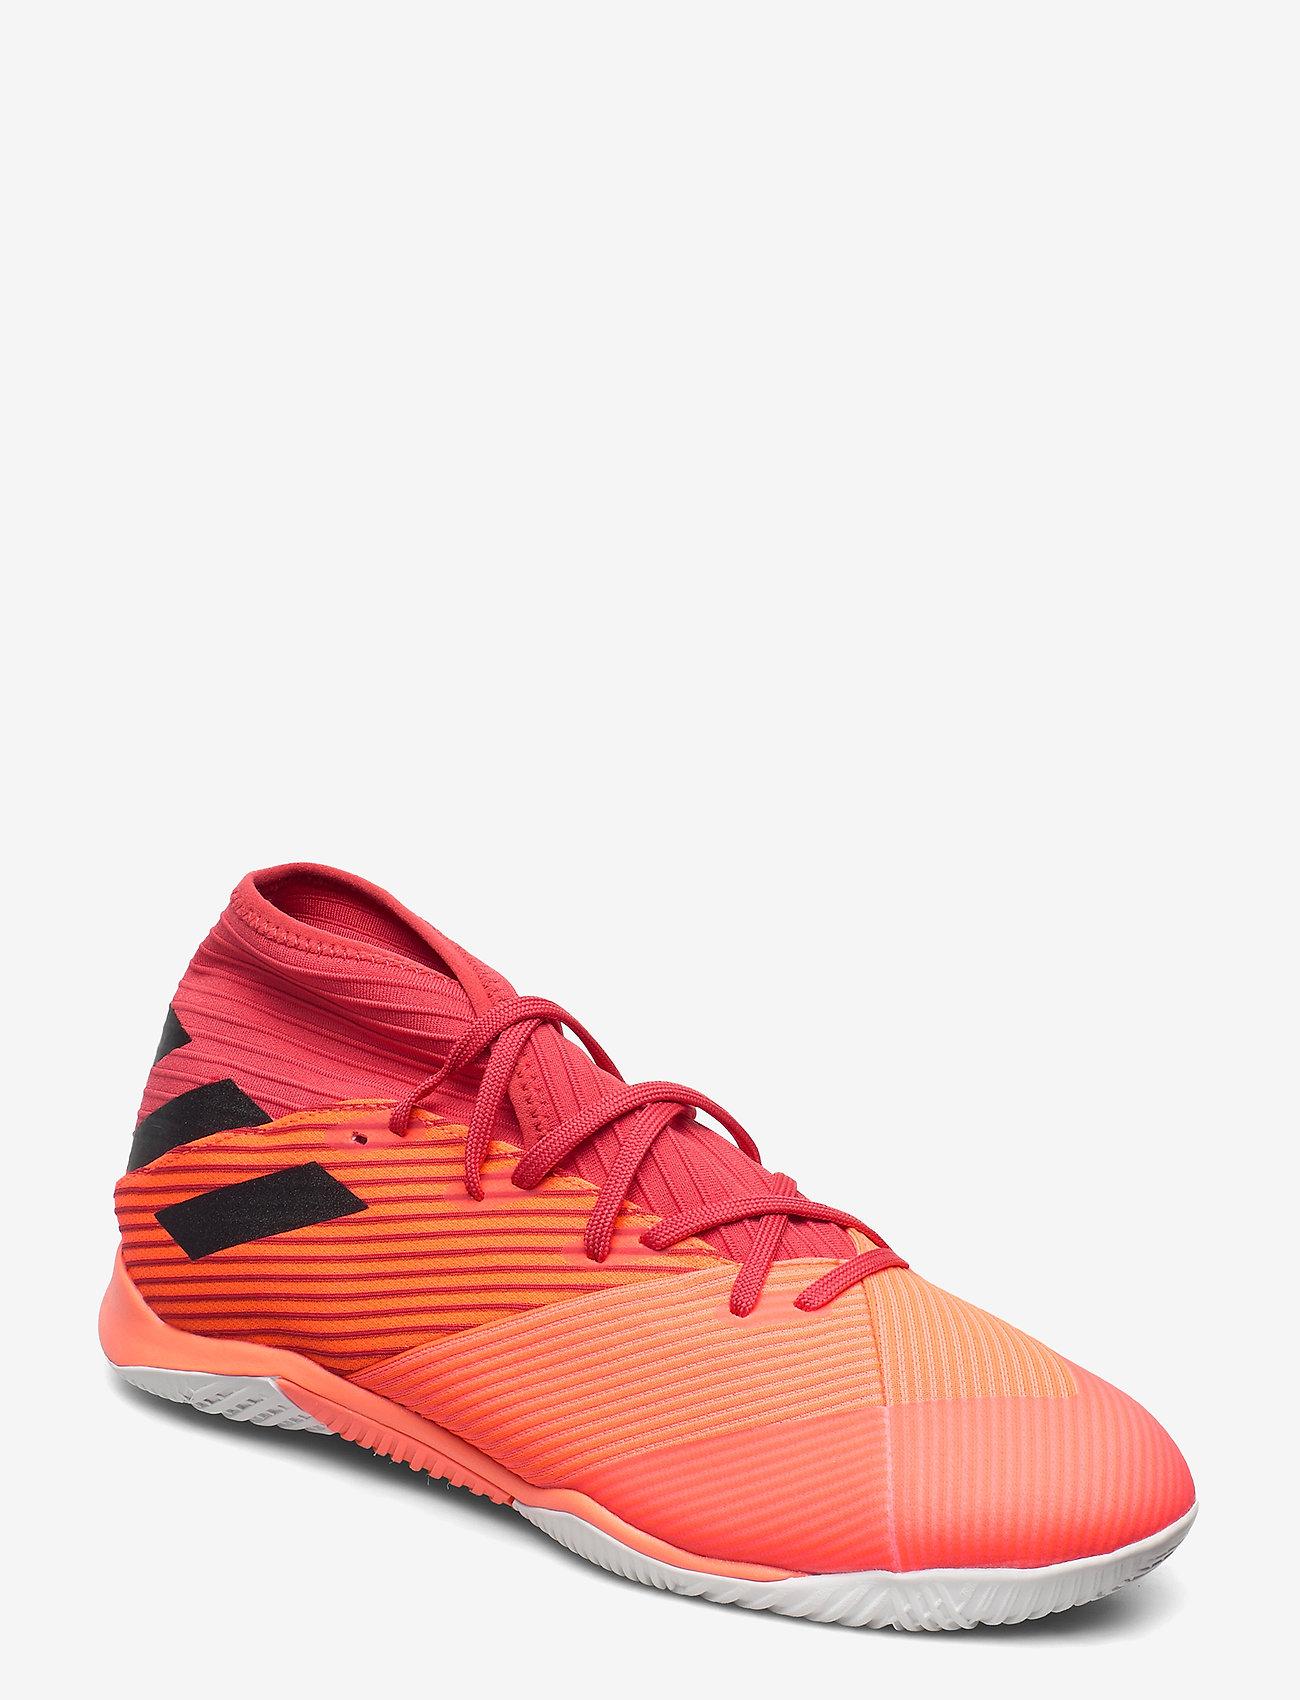 adidas Performance - NEMEZIZ 19.3 IN - fodboldsko - sigcor/cblack/glored - 0